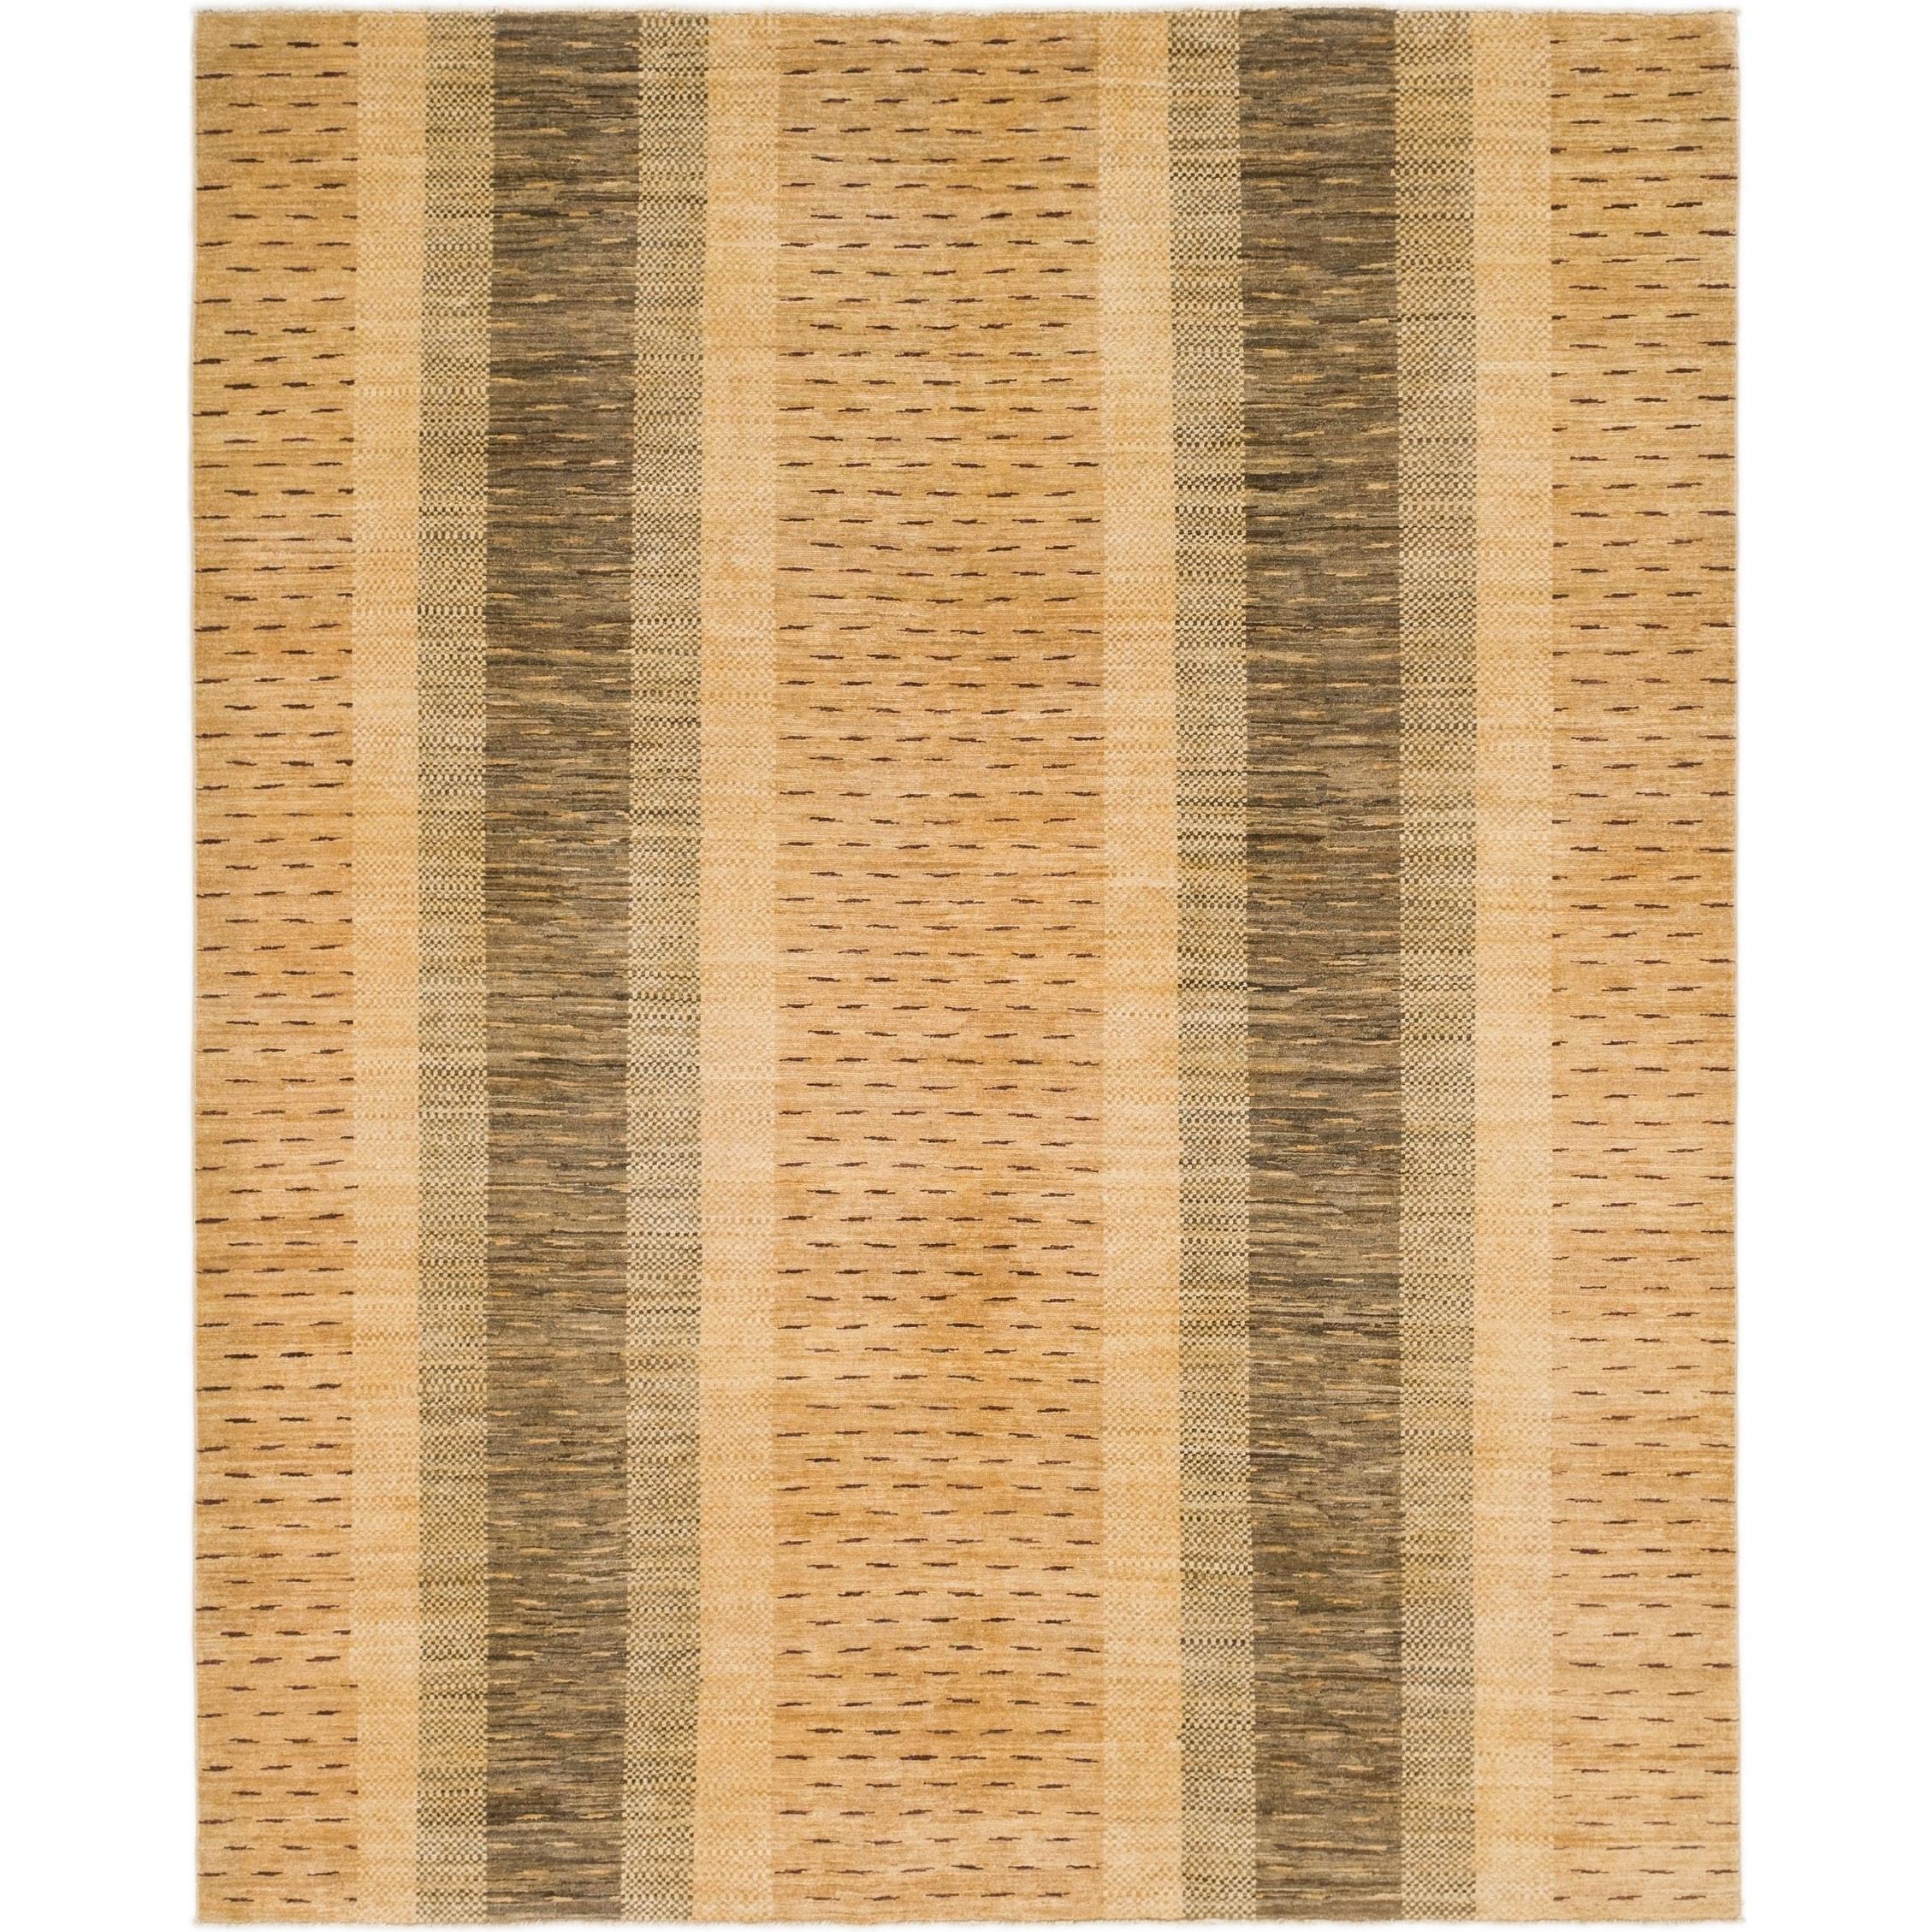 Hand Knotted Kashkuli Gabbeh Wool Area Rug - 6 9 x 8 4 (Tan - 6 9 x 8 4)